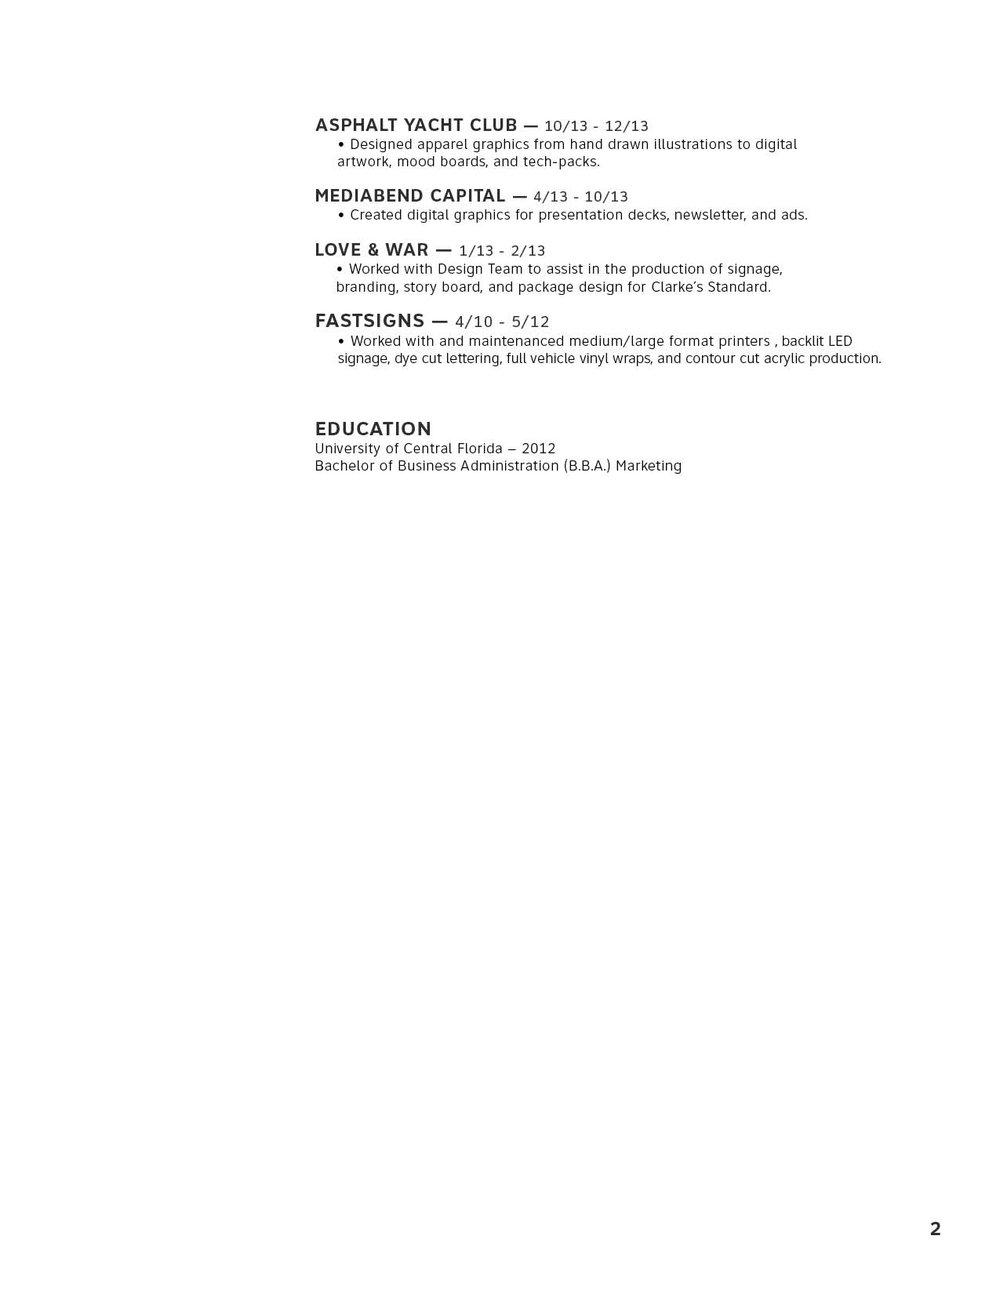 Resume20182.jpg